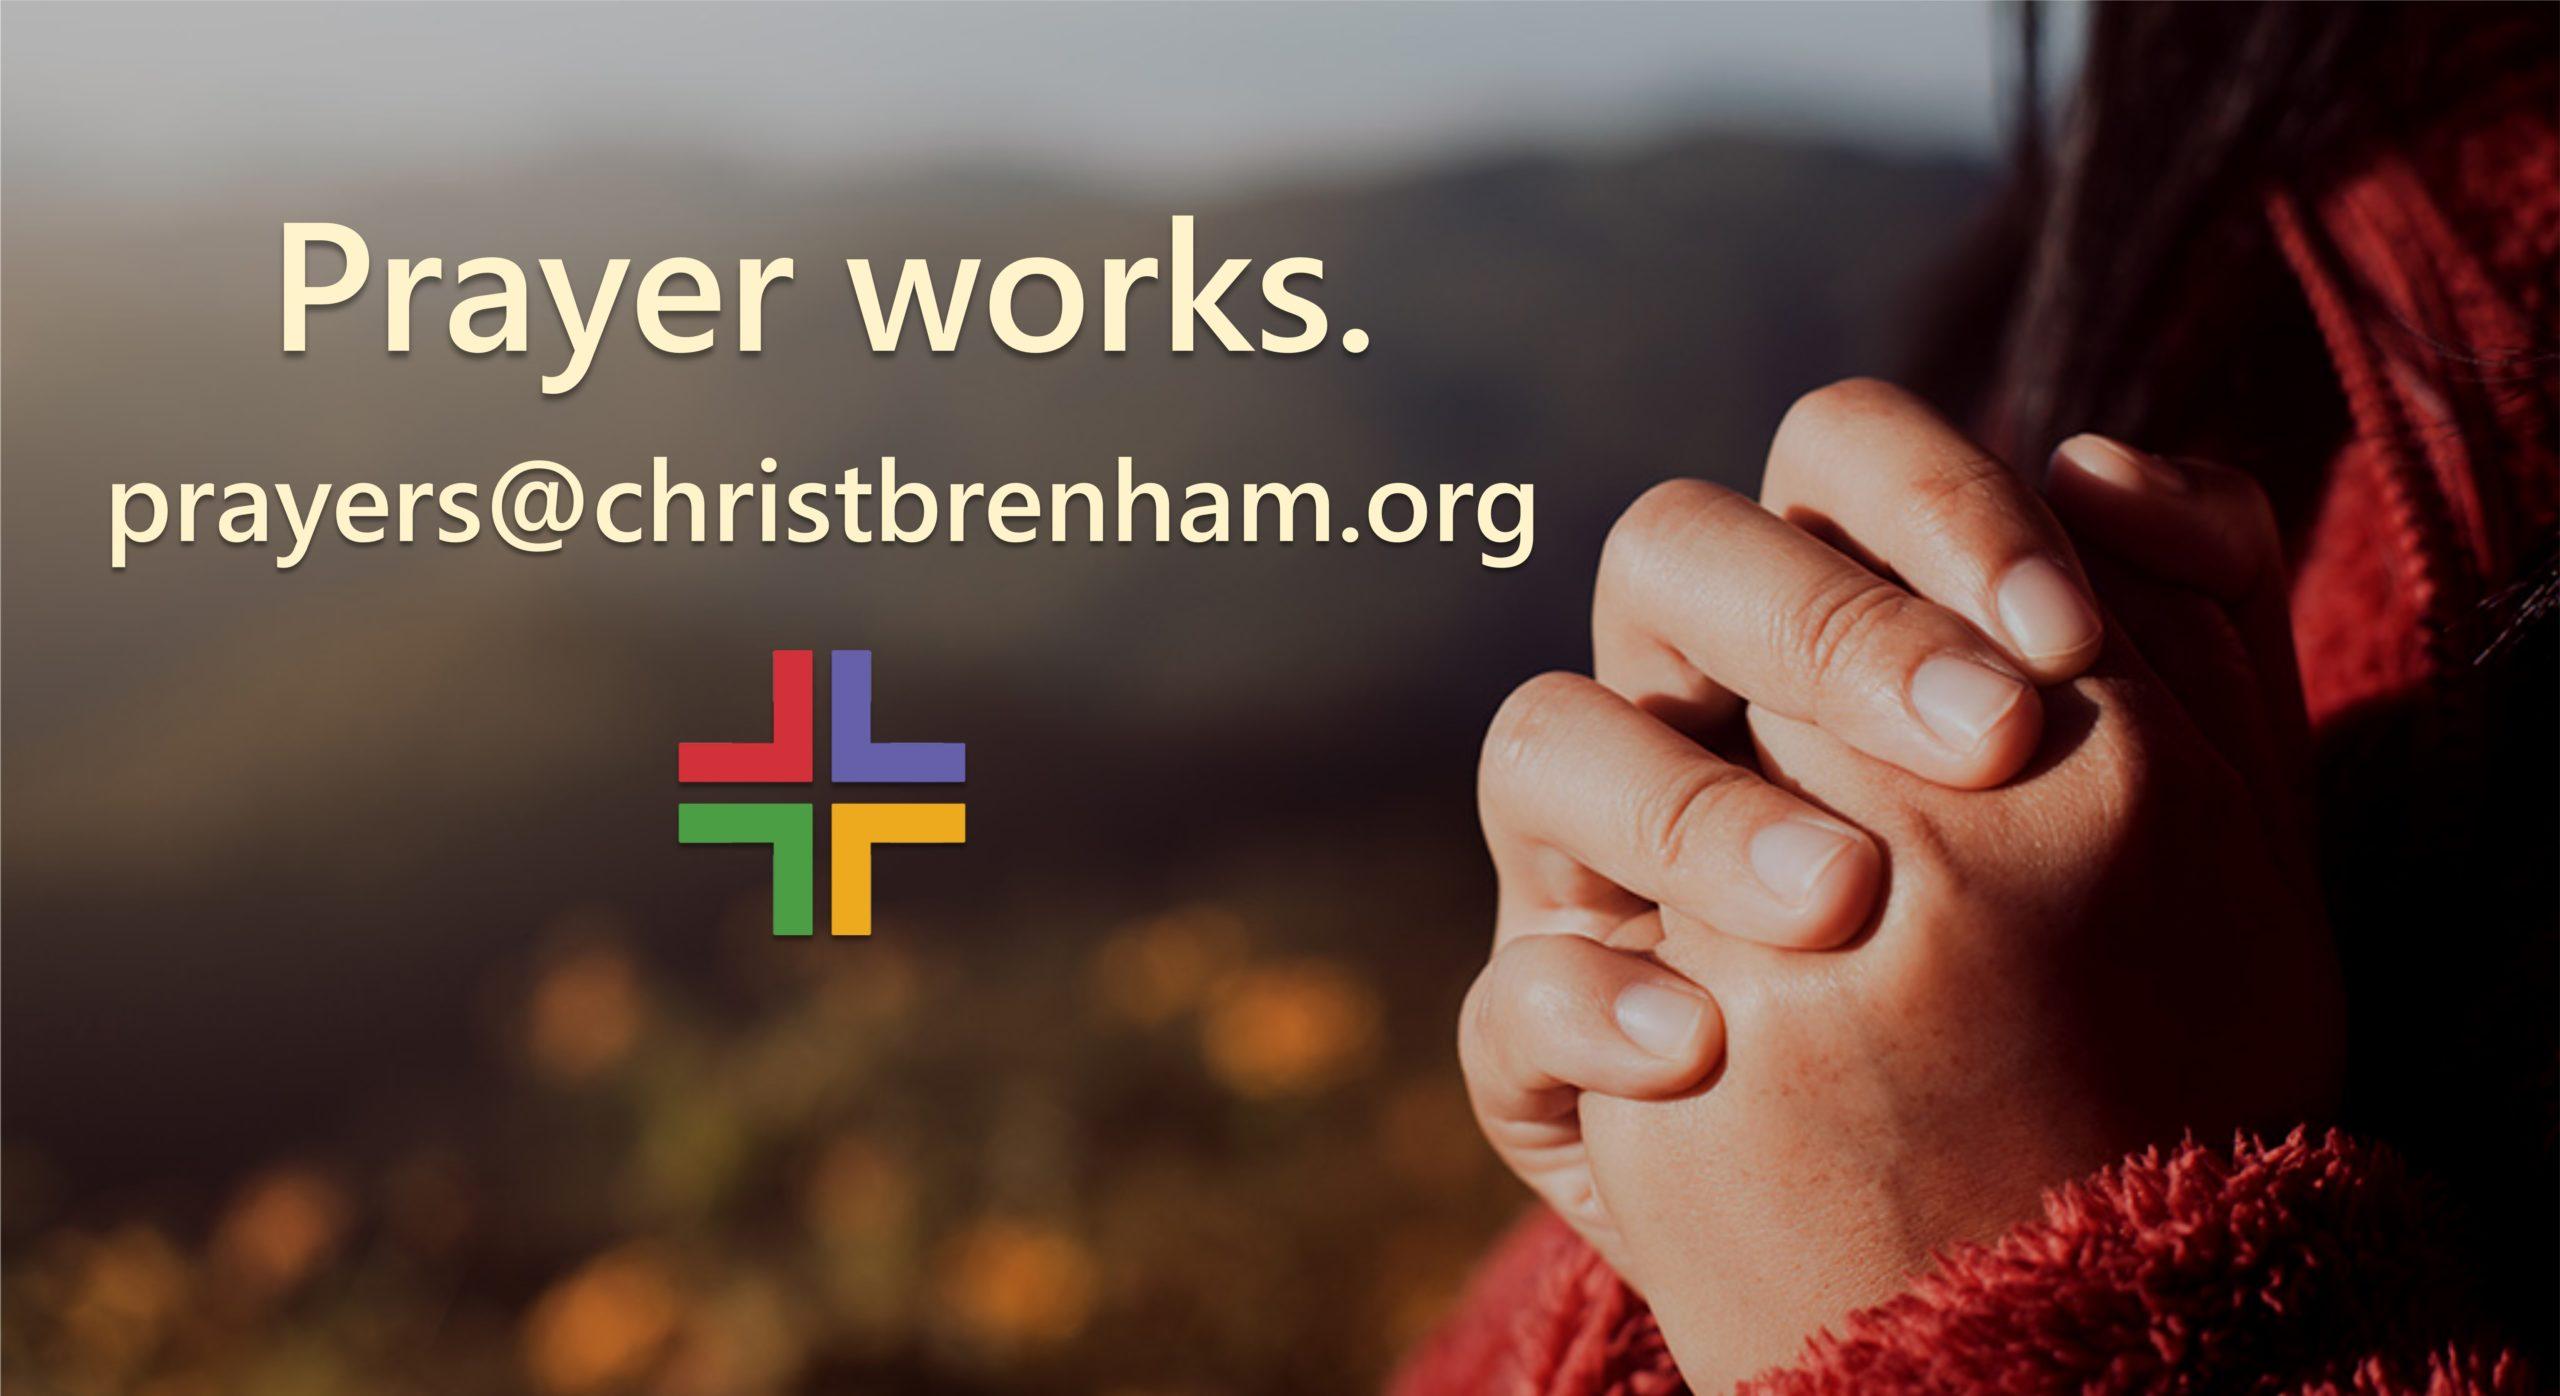 Prayer Works ad